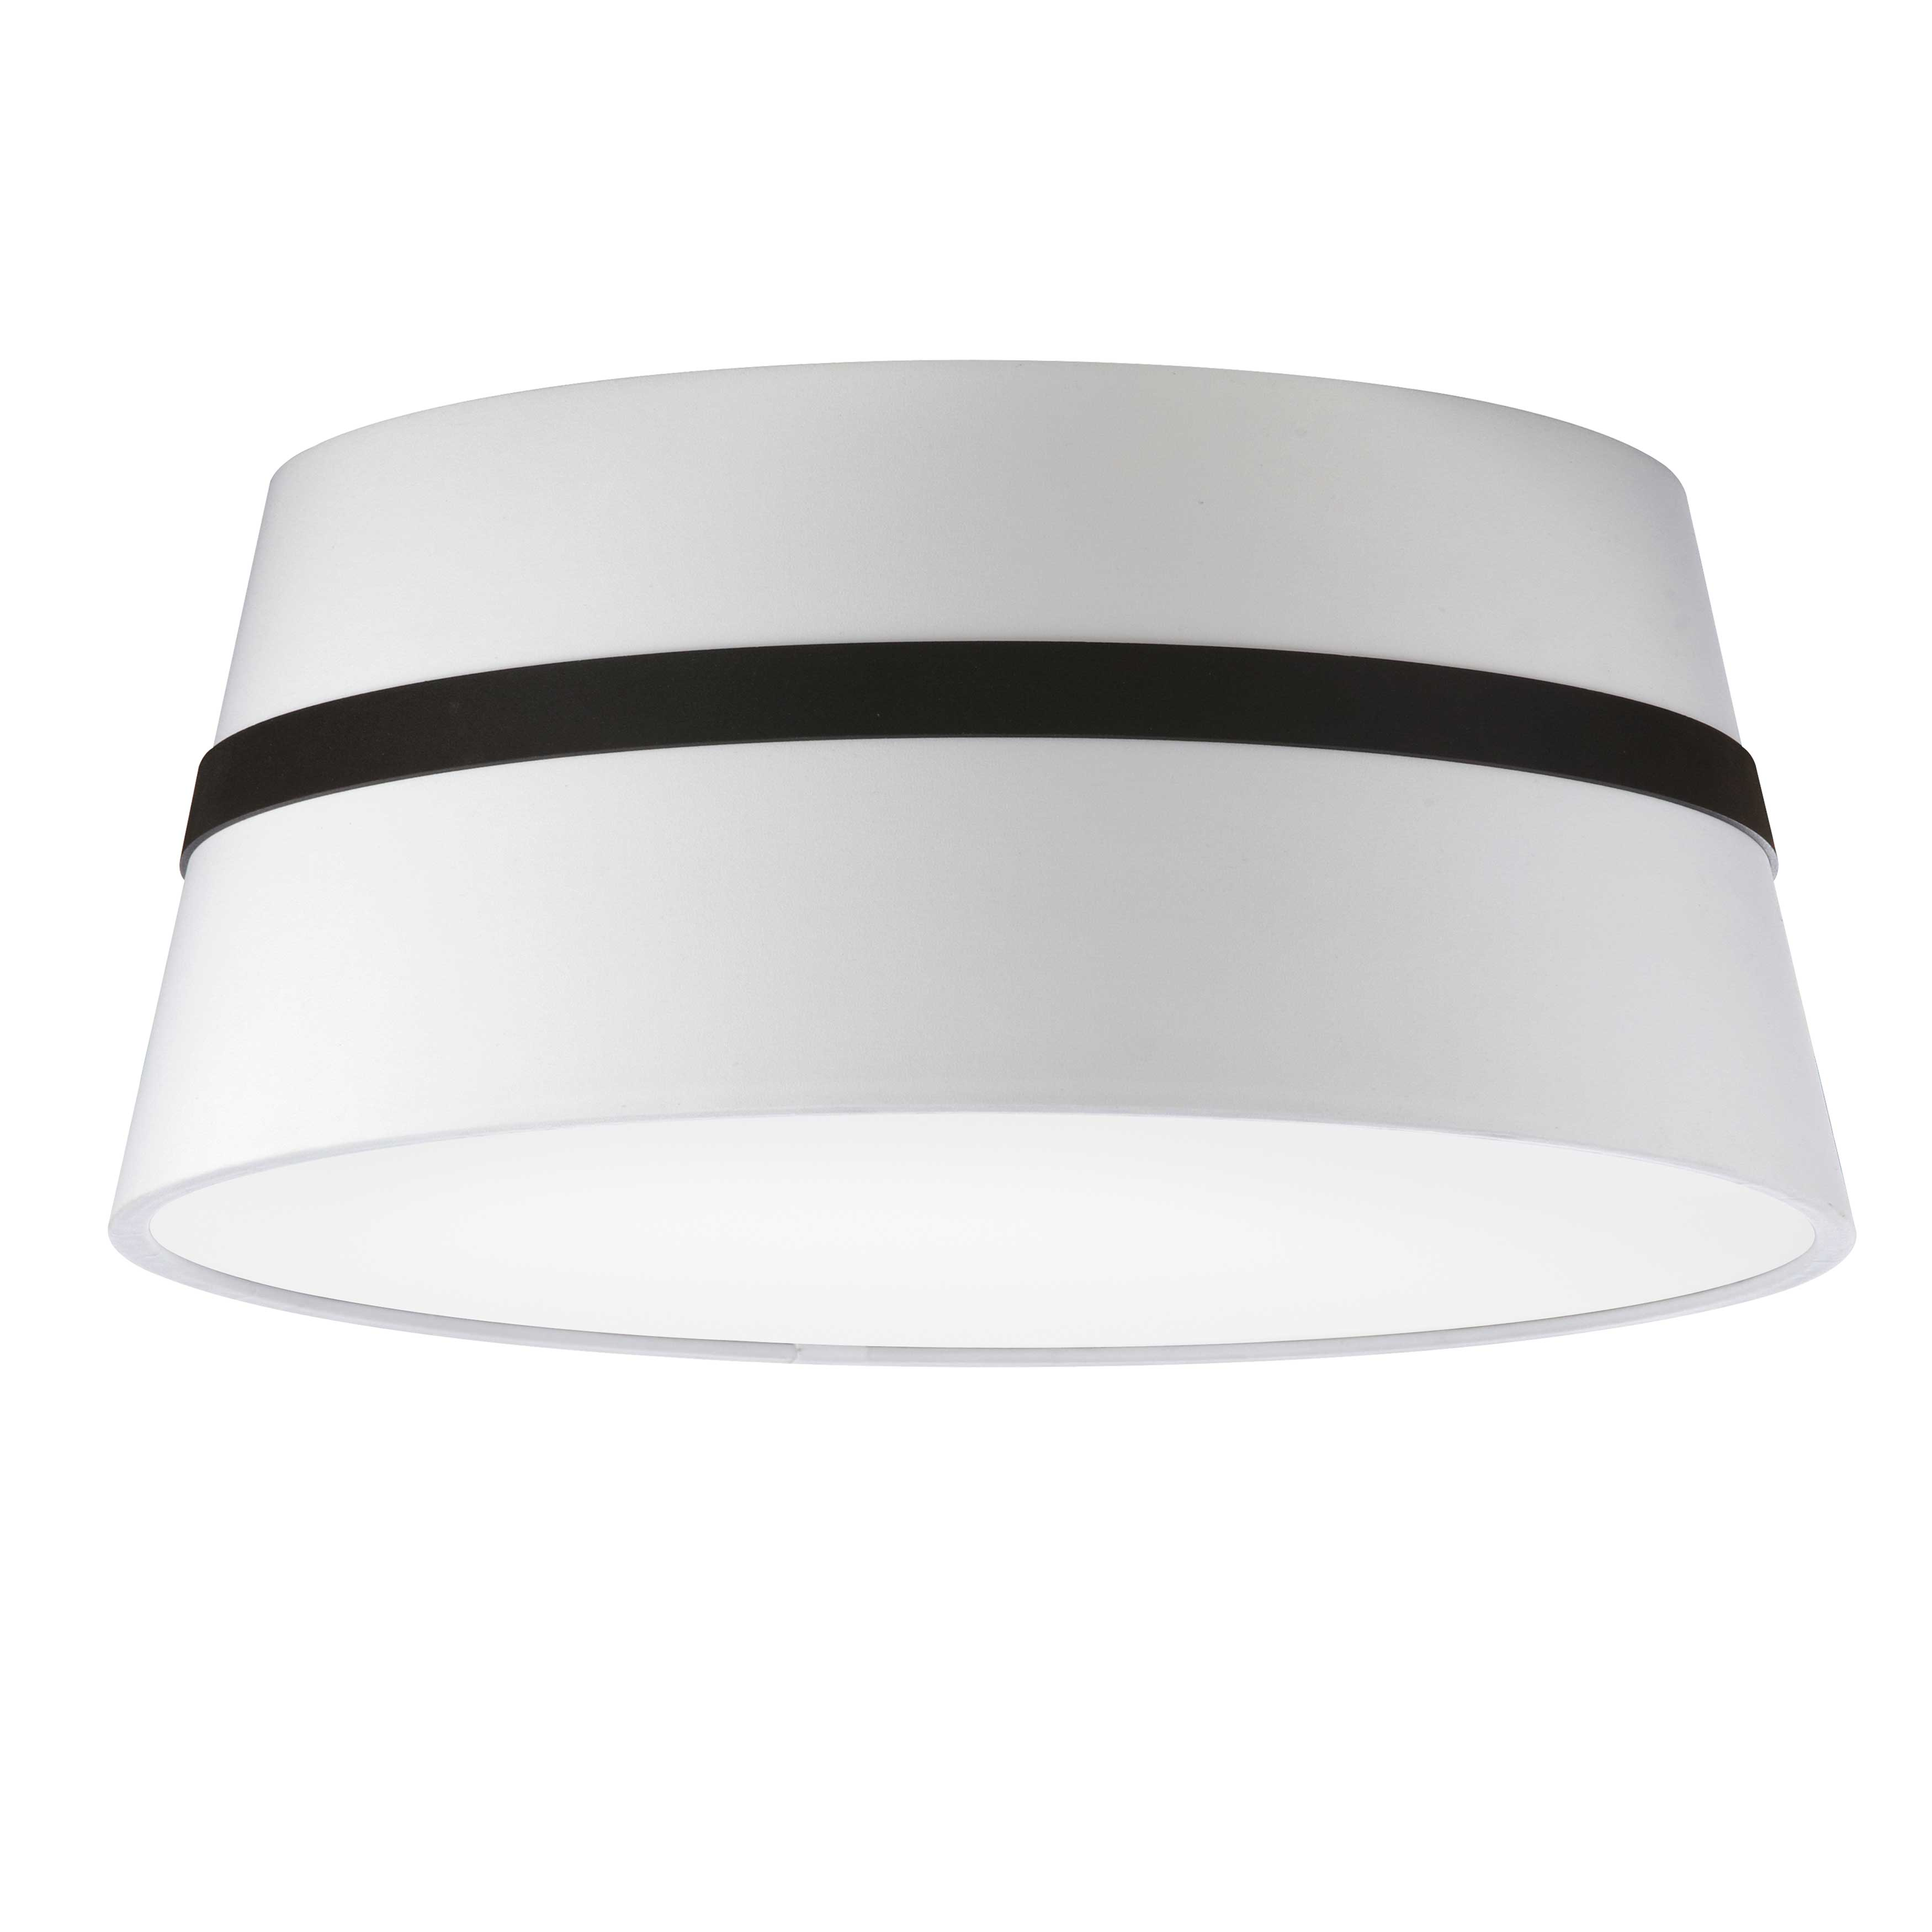 3 Light Incandescent Matte Black Semi-Flush Mount w/ White Shade